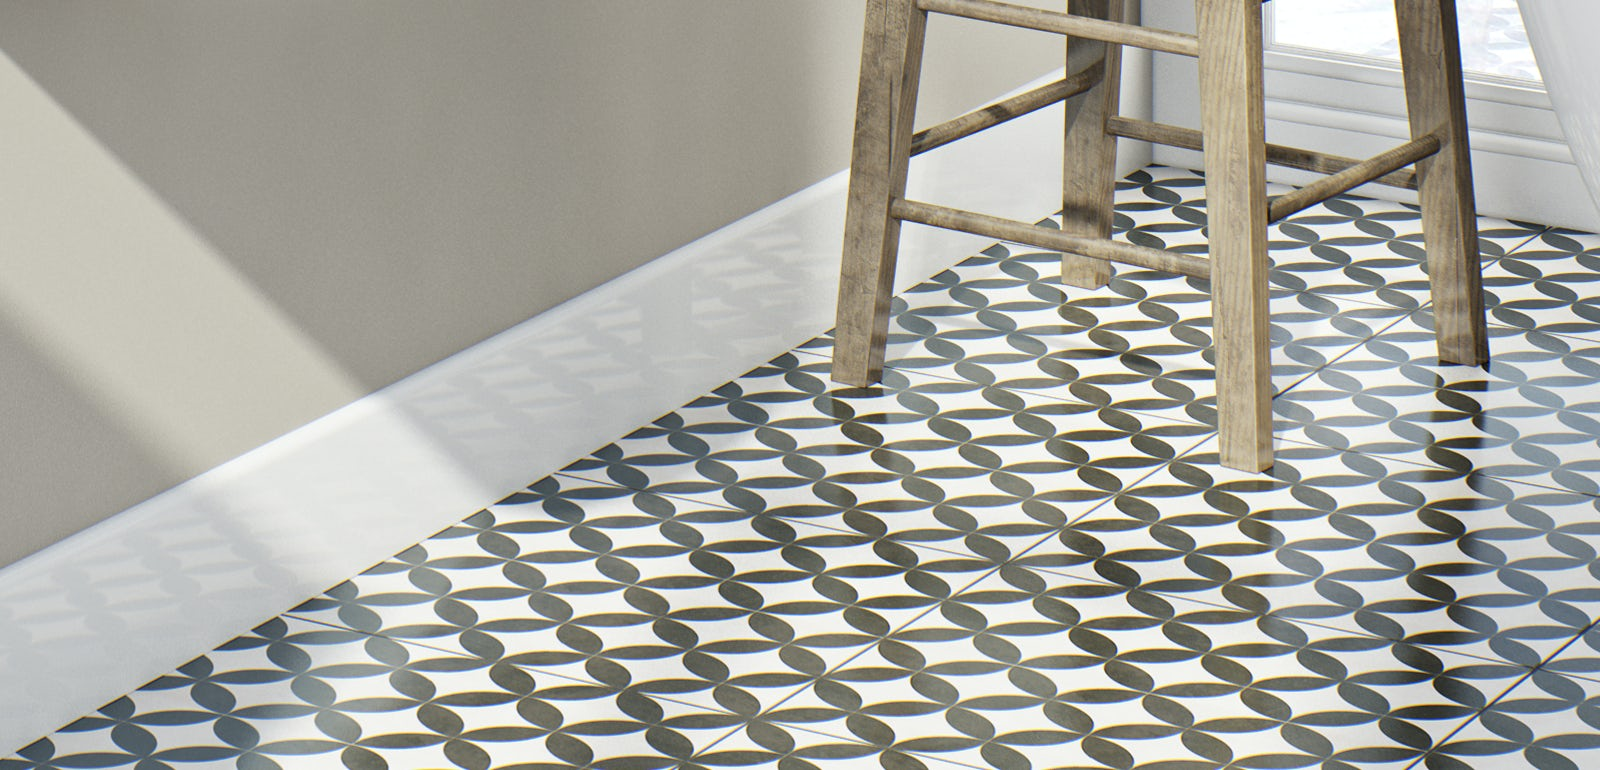 Vinyl bathroom flooring tiles